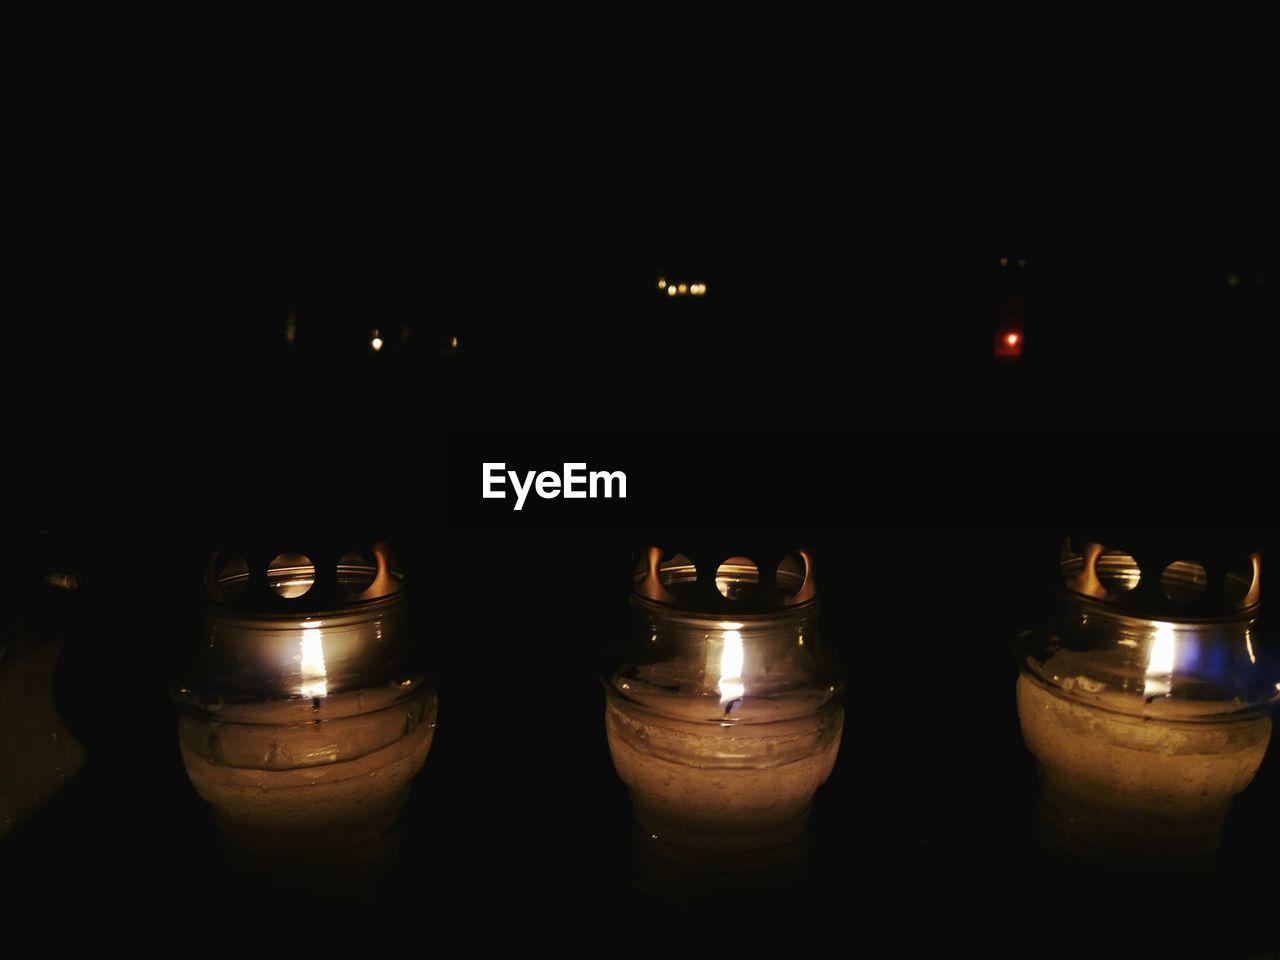 flame, candle, burning, illuminated, heat - temperature, tea light, glowing, darkroom, no people, indoors, night, close-up, black background